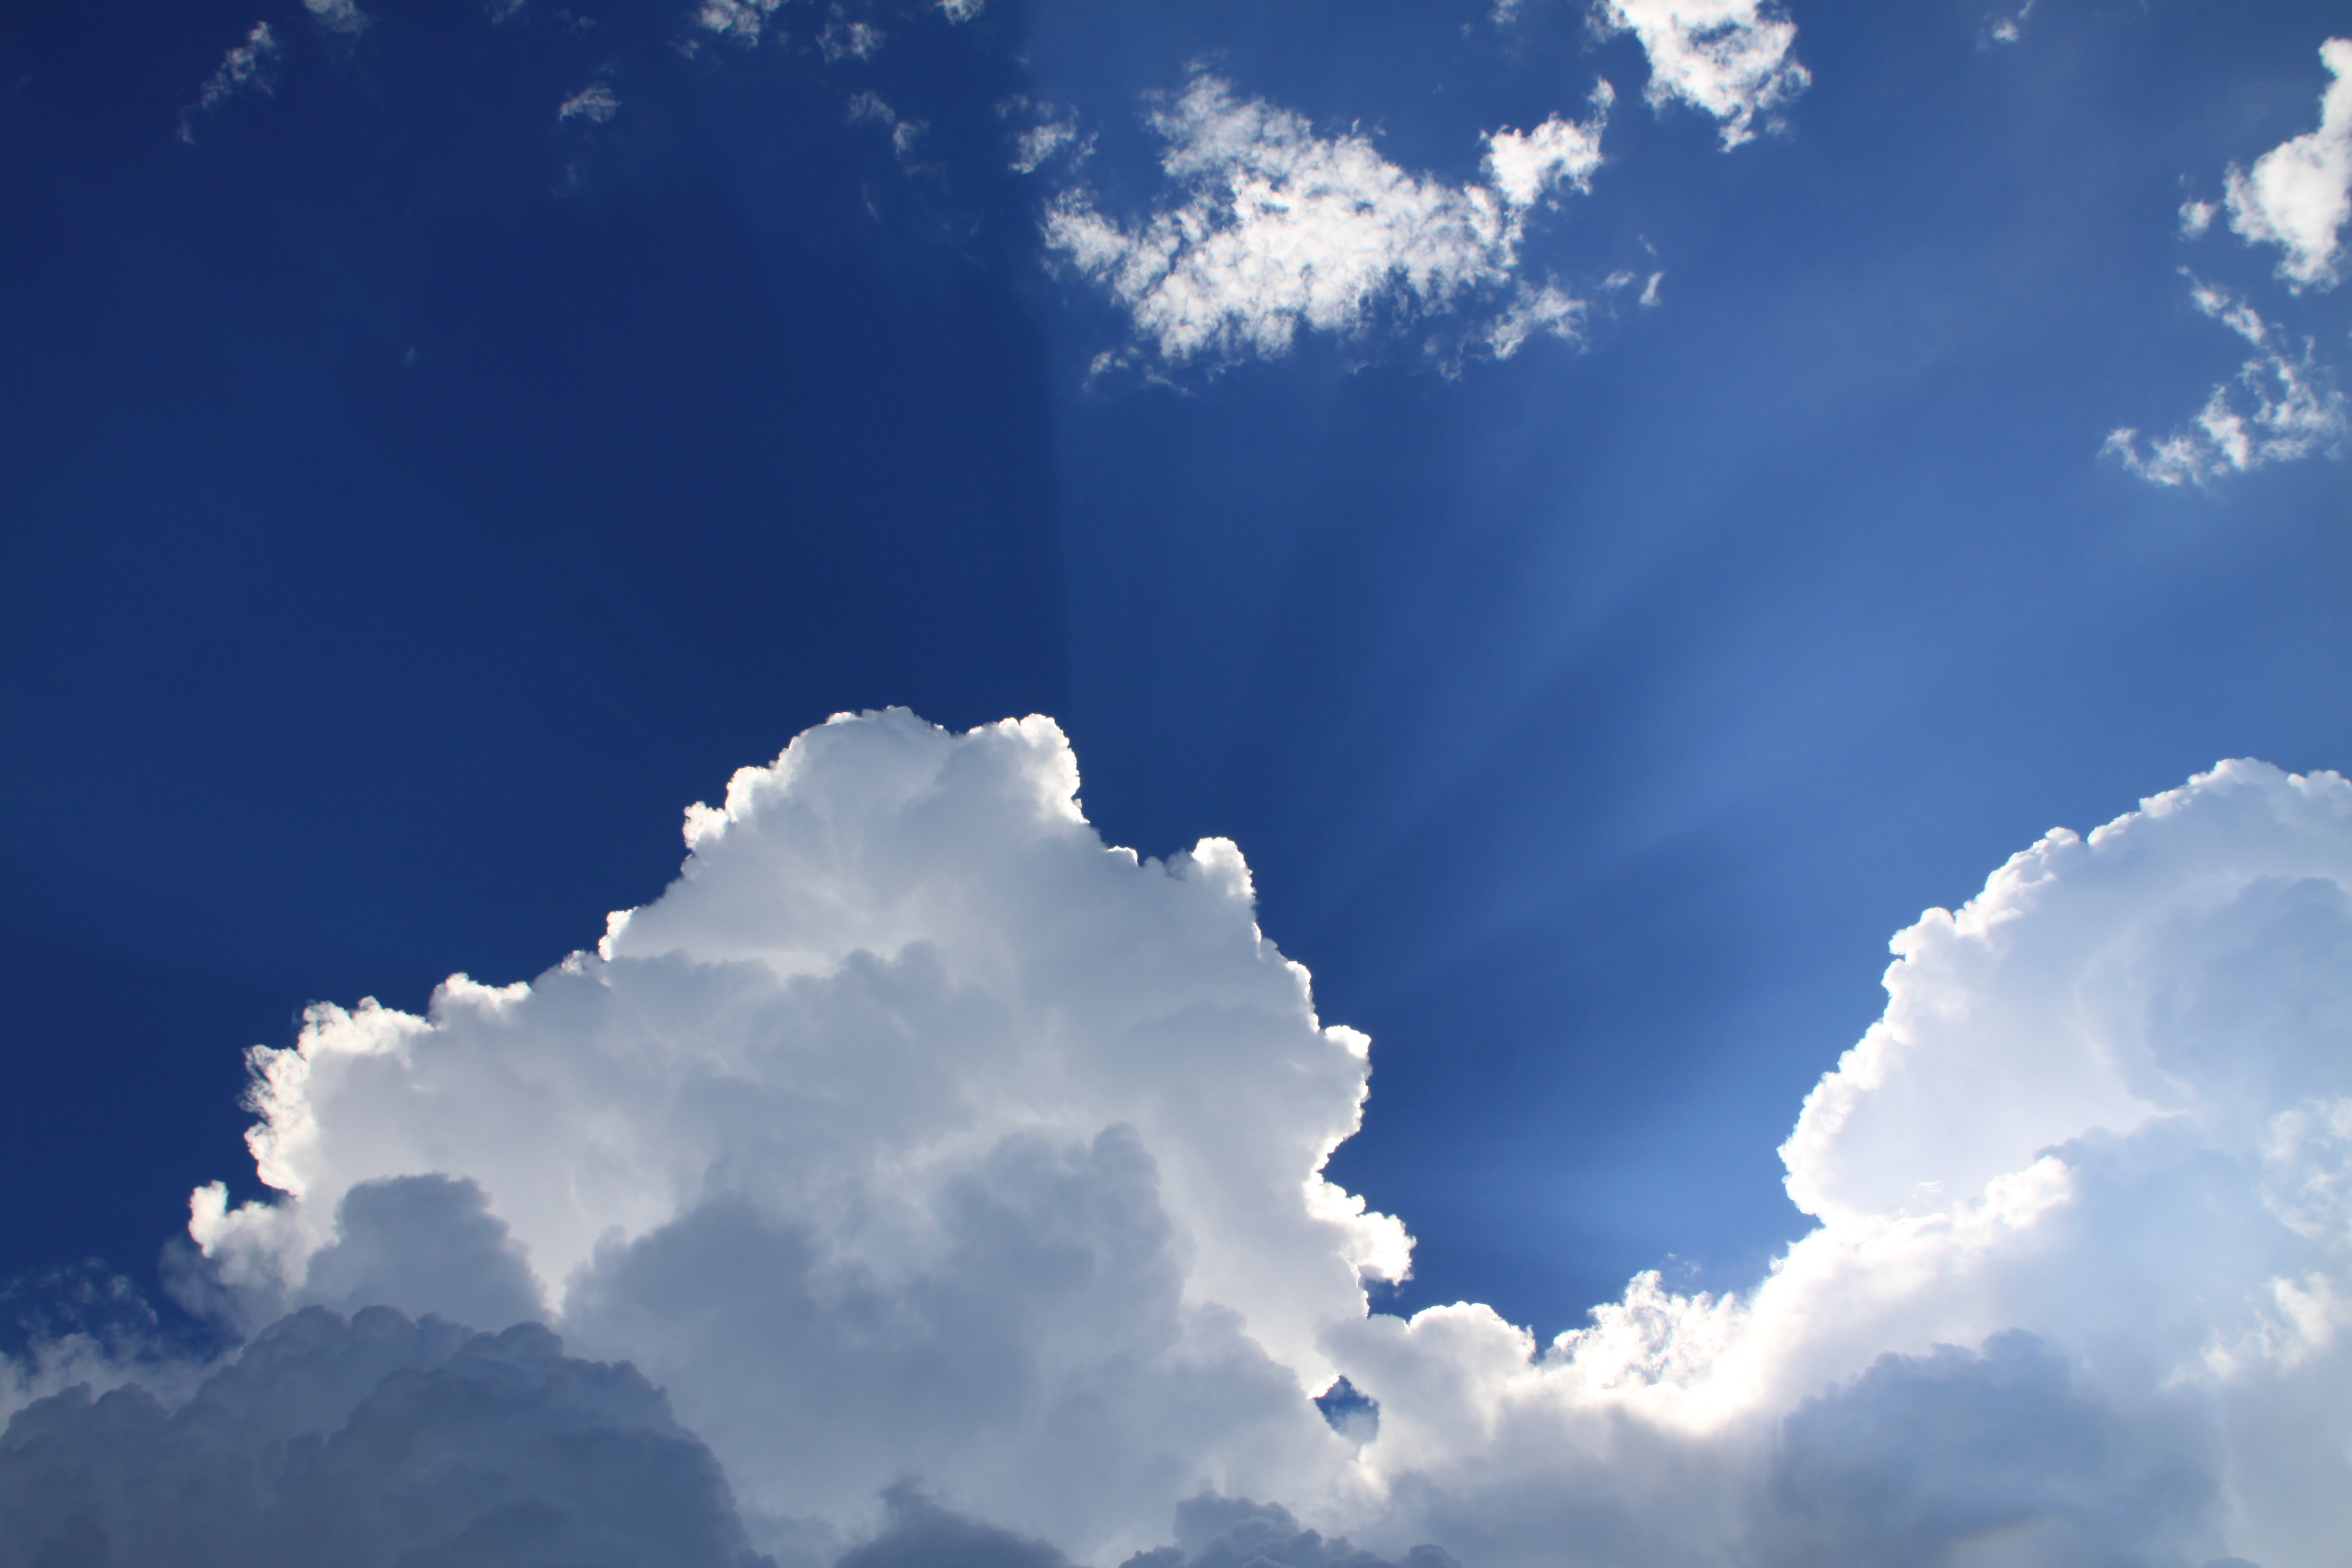 Light follows Darkness: Transition, Gratitude and Trust